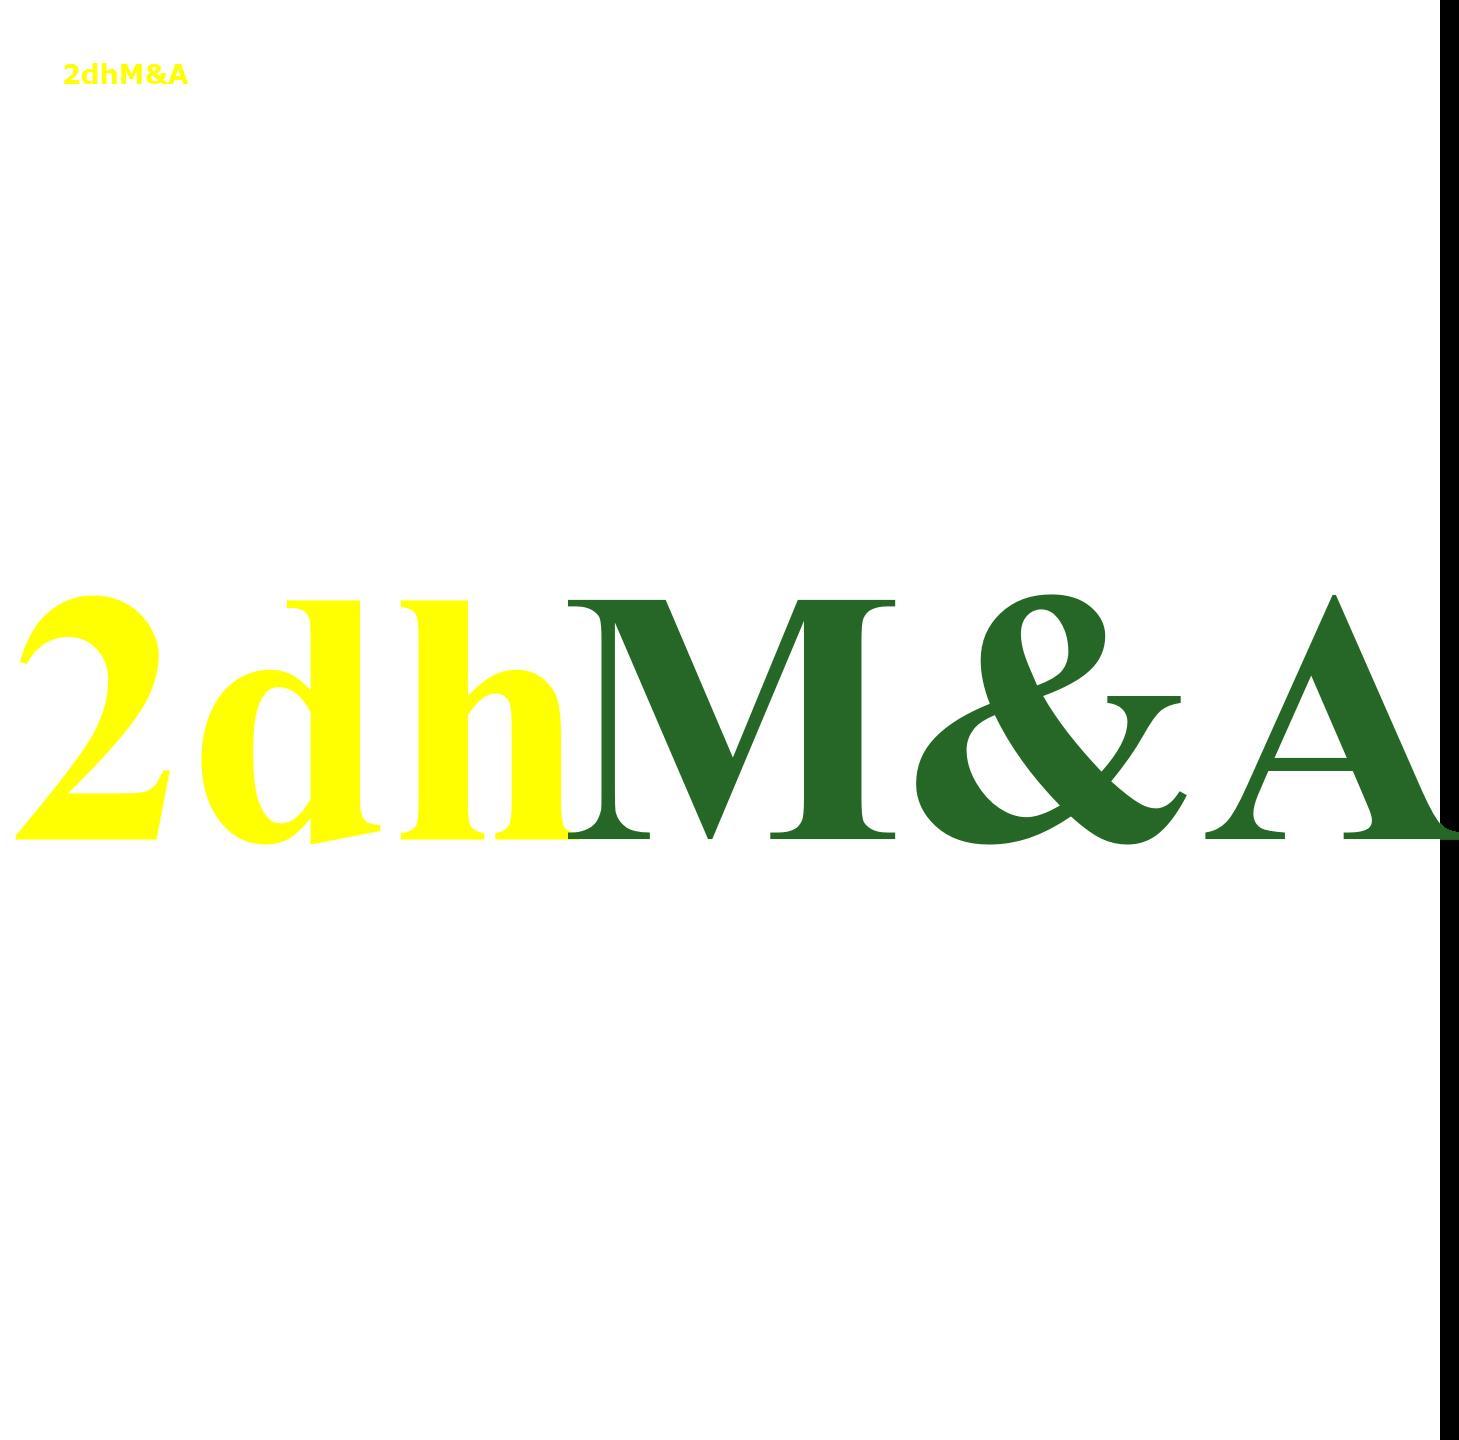 Giới thiệu nhân sự 2dhM&A | P20